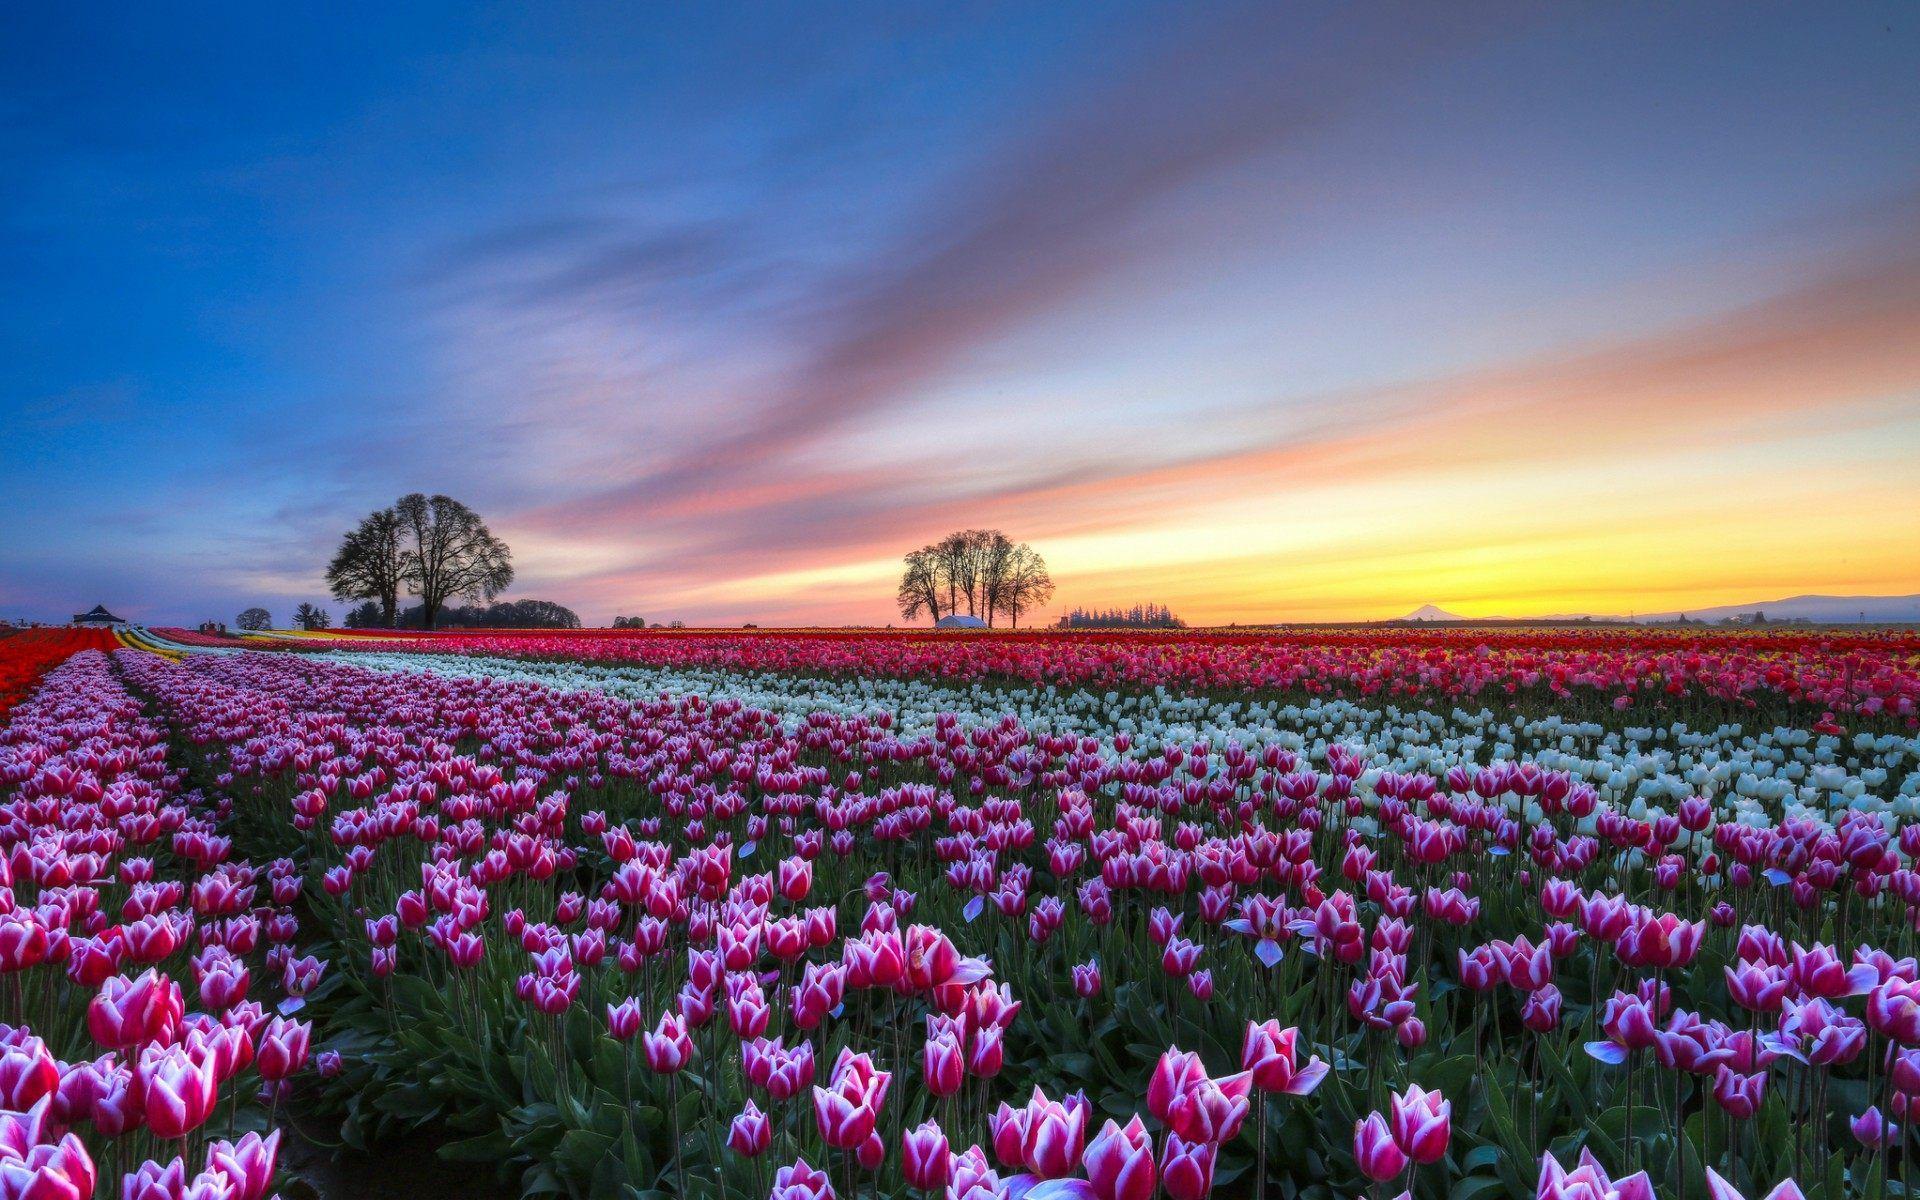 Pink Tulips Flower Field Scenery 1920x1200 Followme Cooliphone6case On Twitter Facebook Scenery Wallpaper Field Wallpaper Flowers Photography Wallpaper